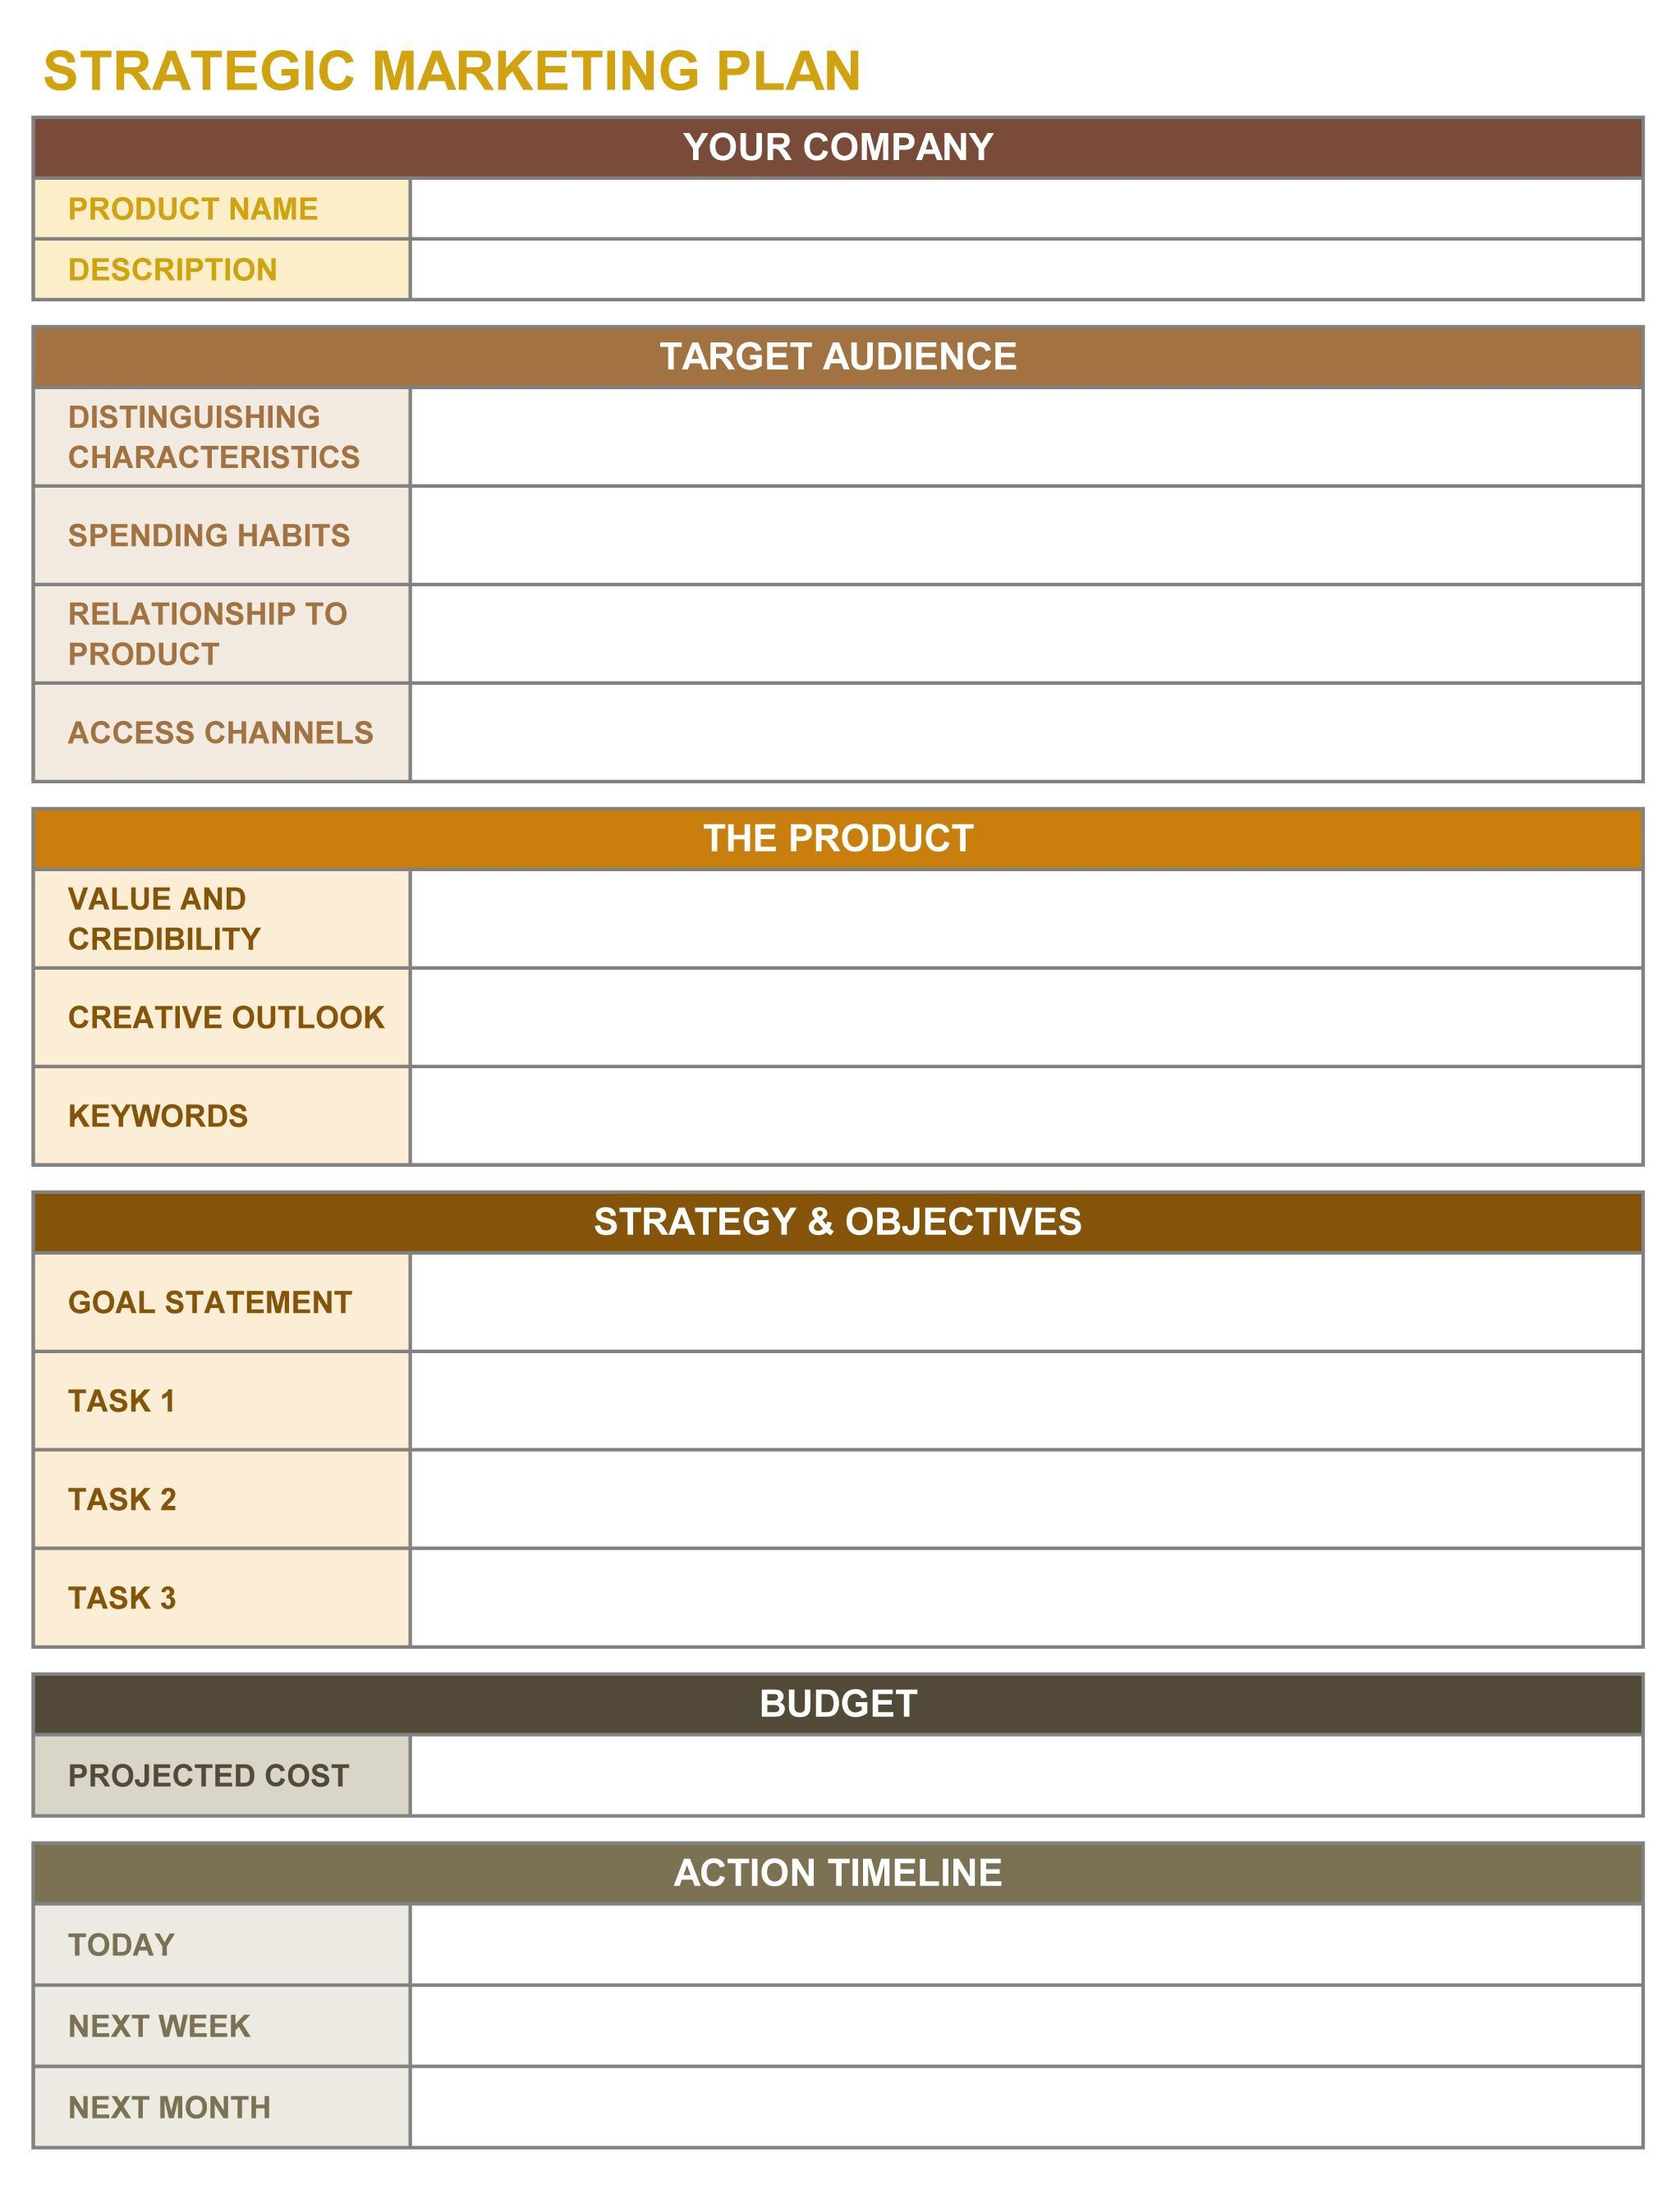 000 Wondrou Strategic Marketing Plan Template Image  Templates Example Pdf Word SampleFull